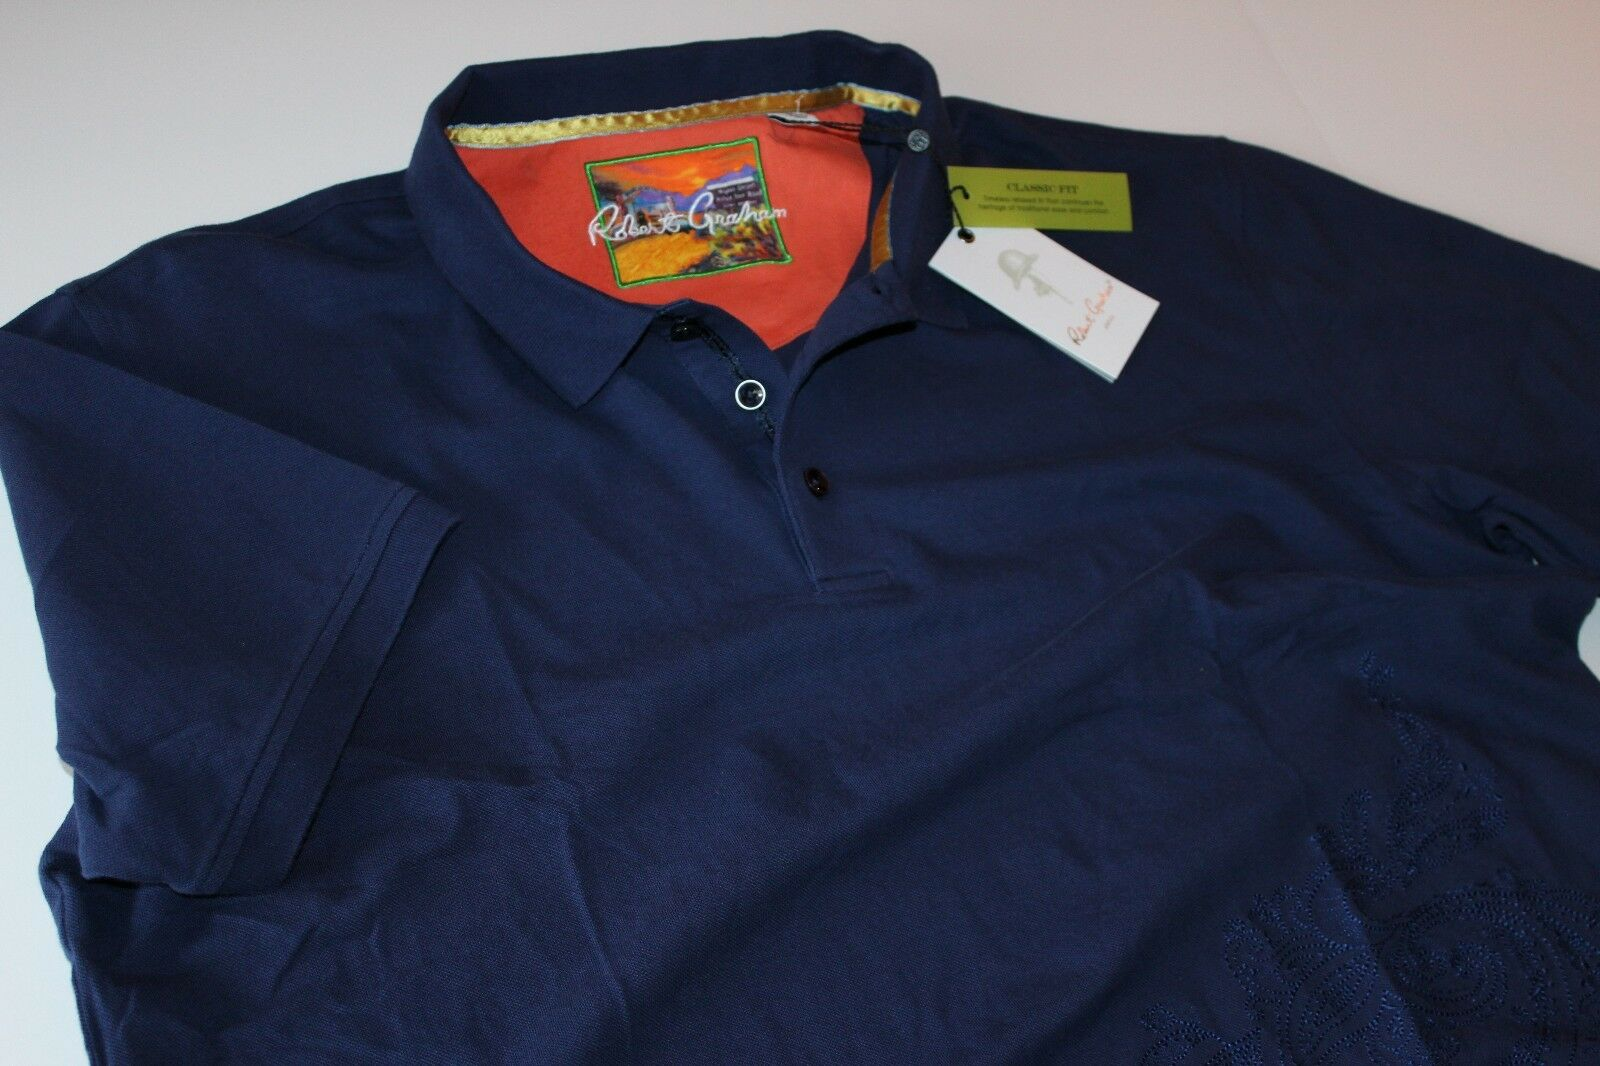 Robert Graham Polo Shirt Jawbone Canyon Navy RP167005CF New Extra Large XL